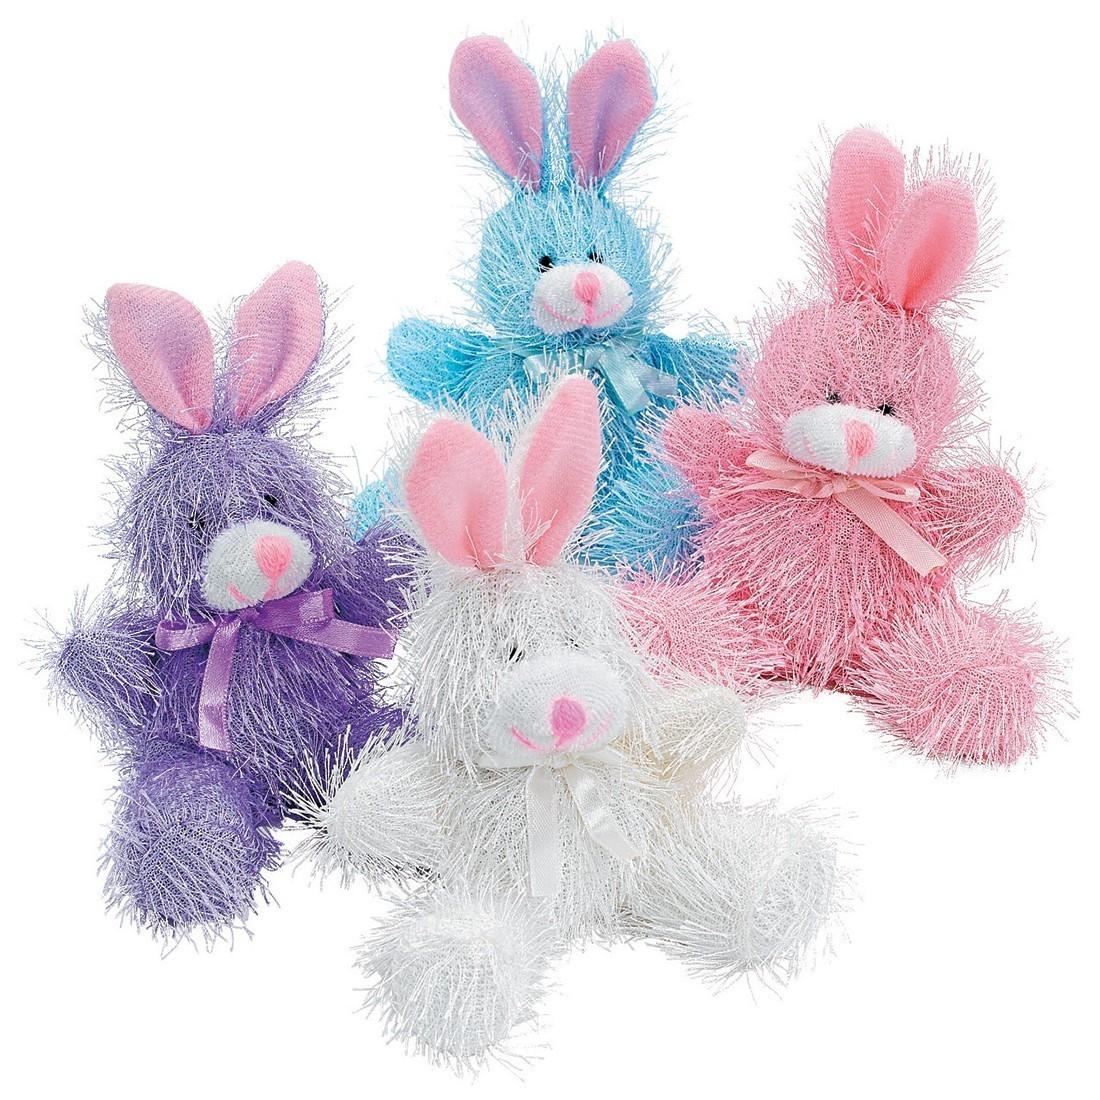 Plush Furry Bunnies [image]